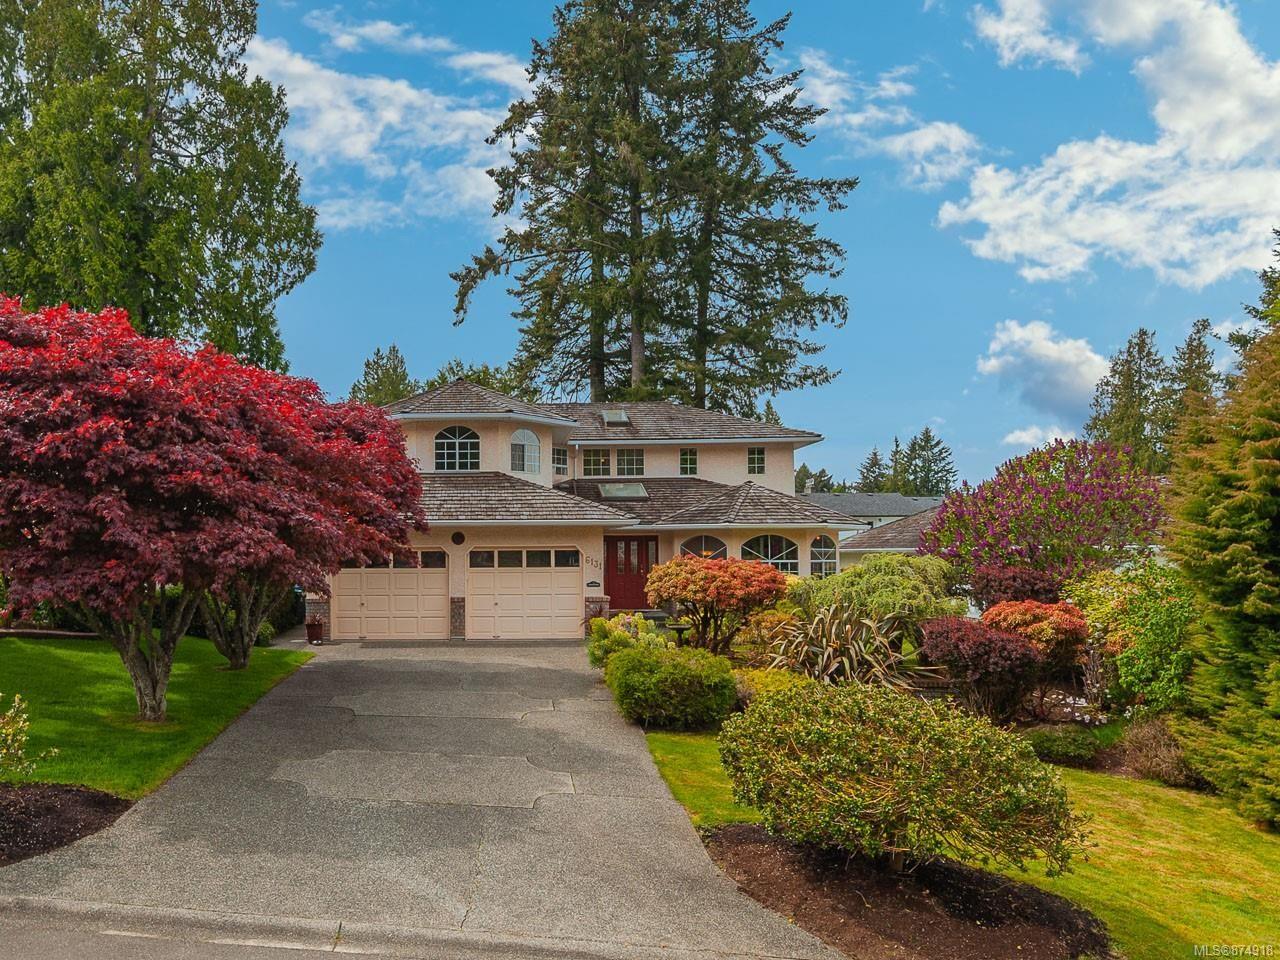 Main Photo: 6131 Greenwood Pl in Nanaimo: Na North Nanaimo House for sale : MLS®# 874918